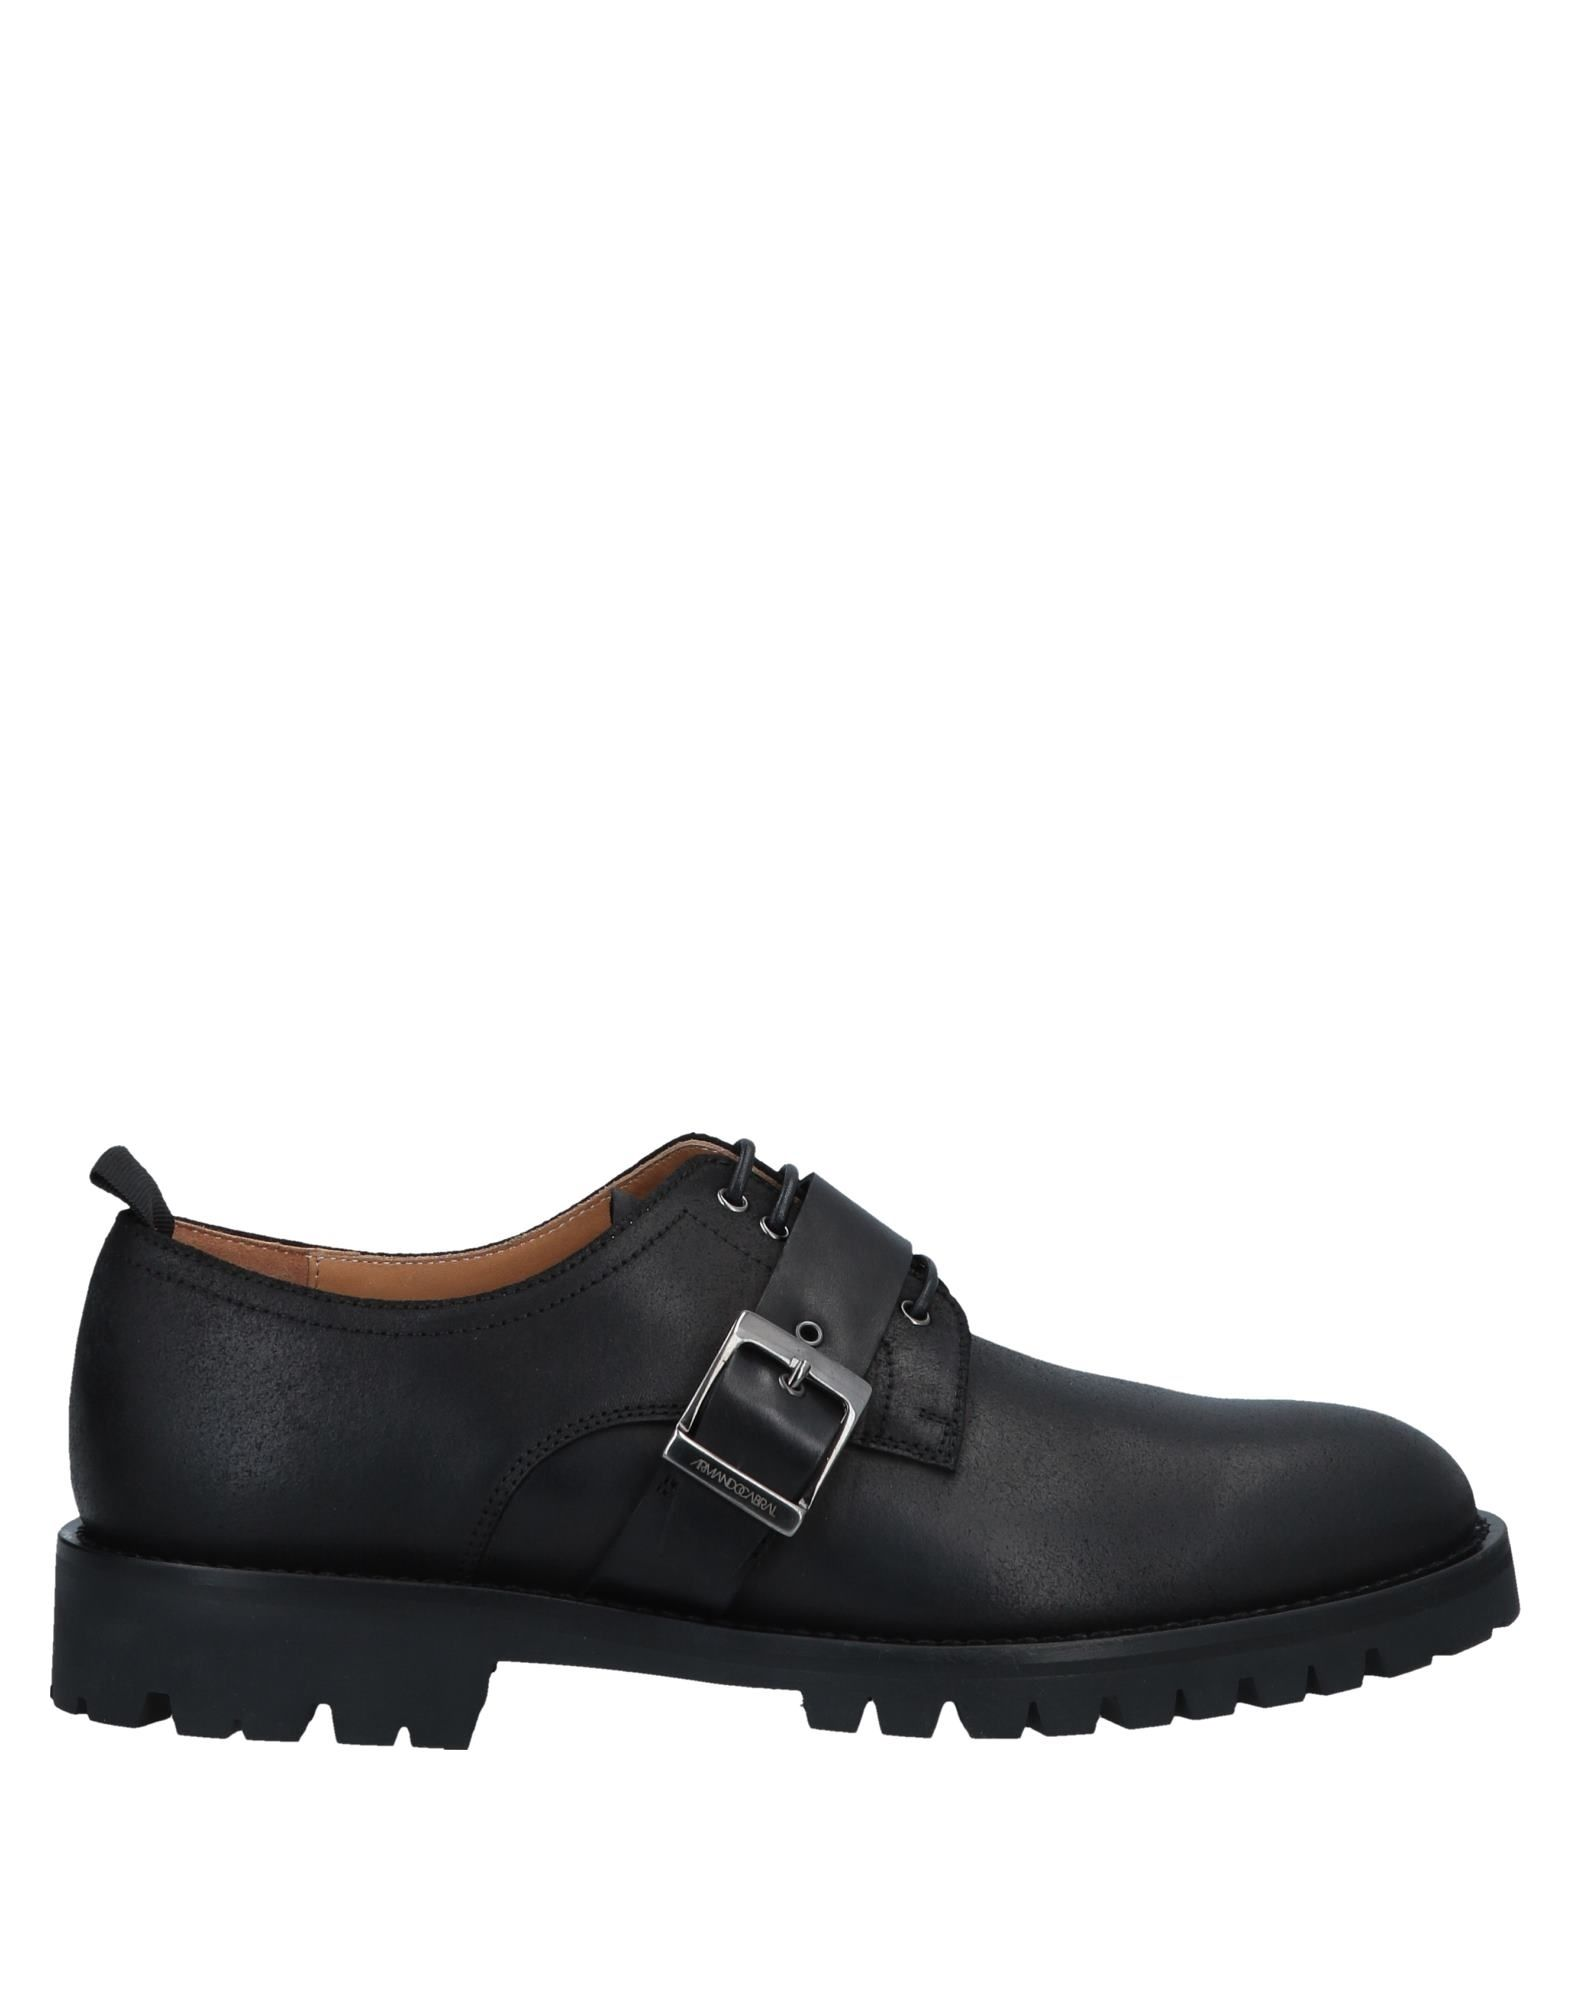 7f863d7c390 ARMANDO CABRAL Обувь на шнурках